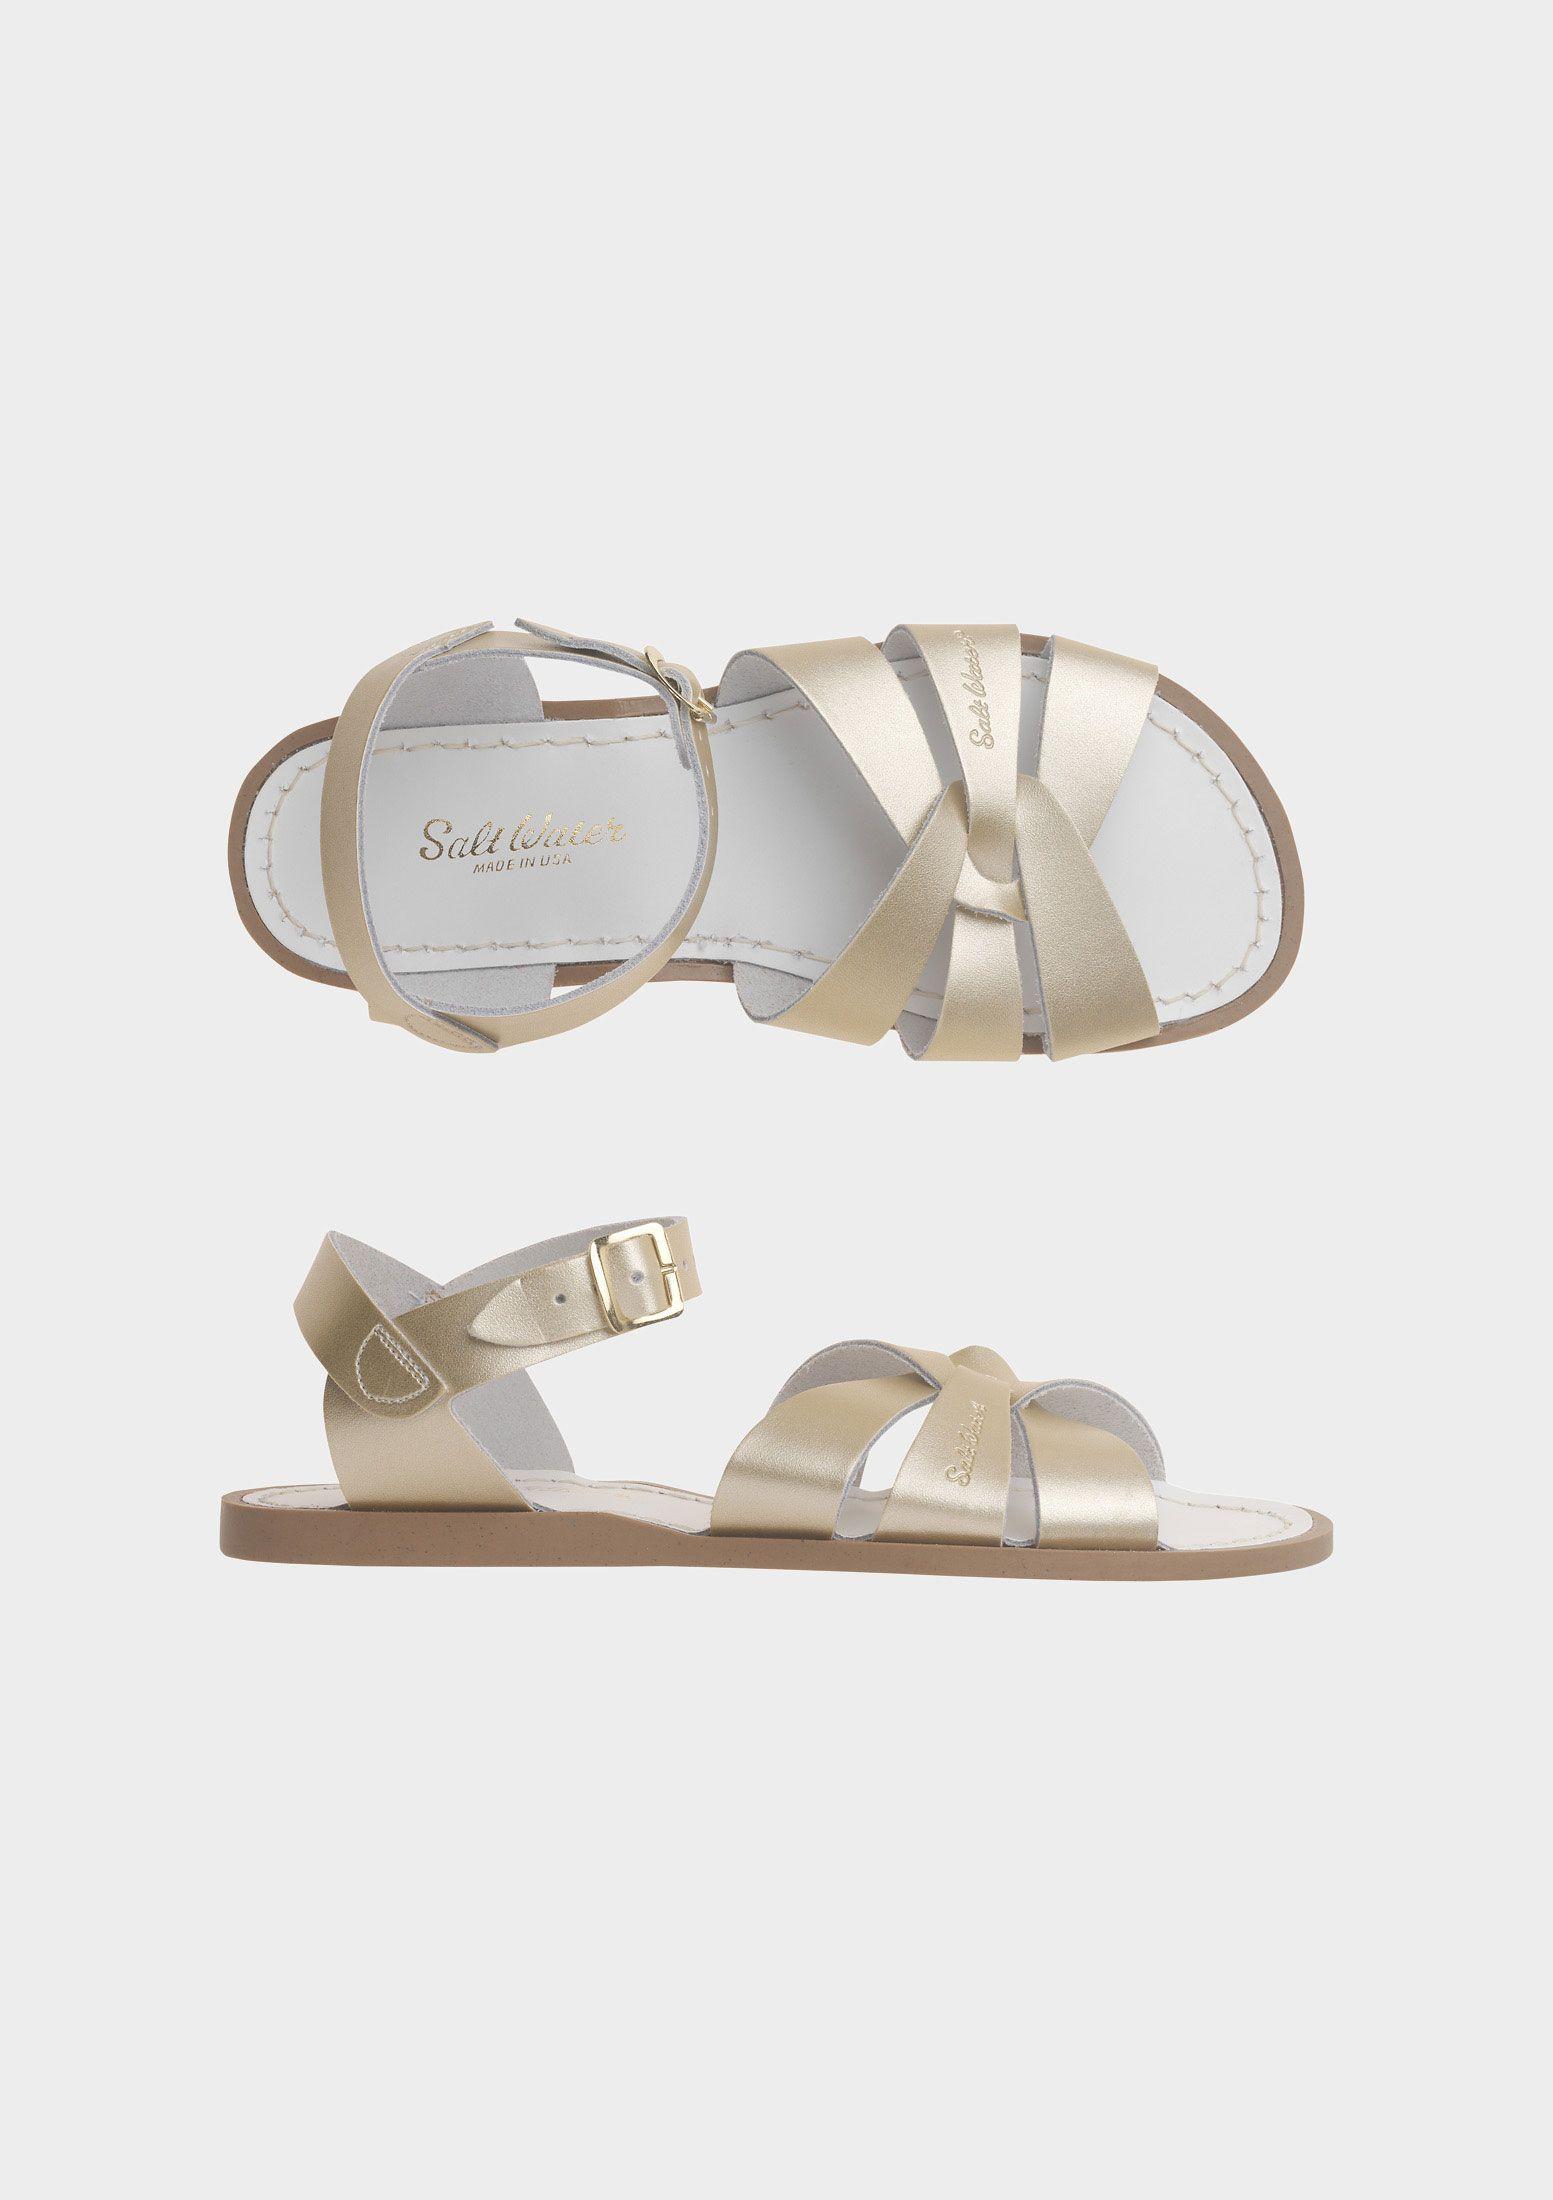 Salt Water Sandal Saltwater Sandals Womens Sandals Sandals